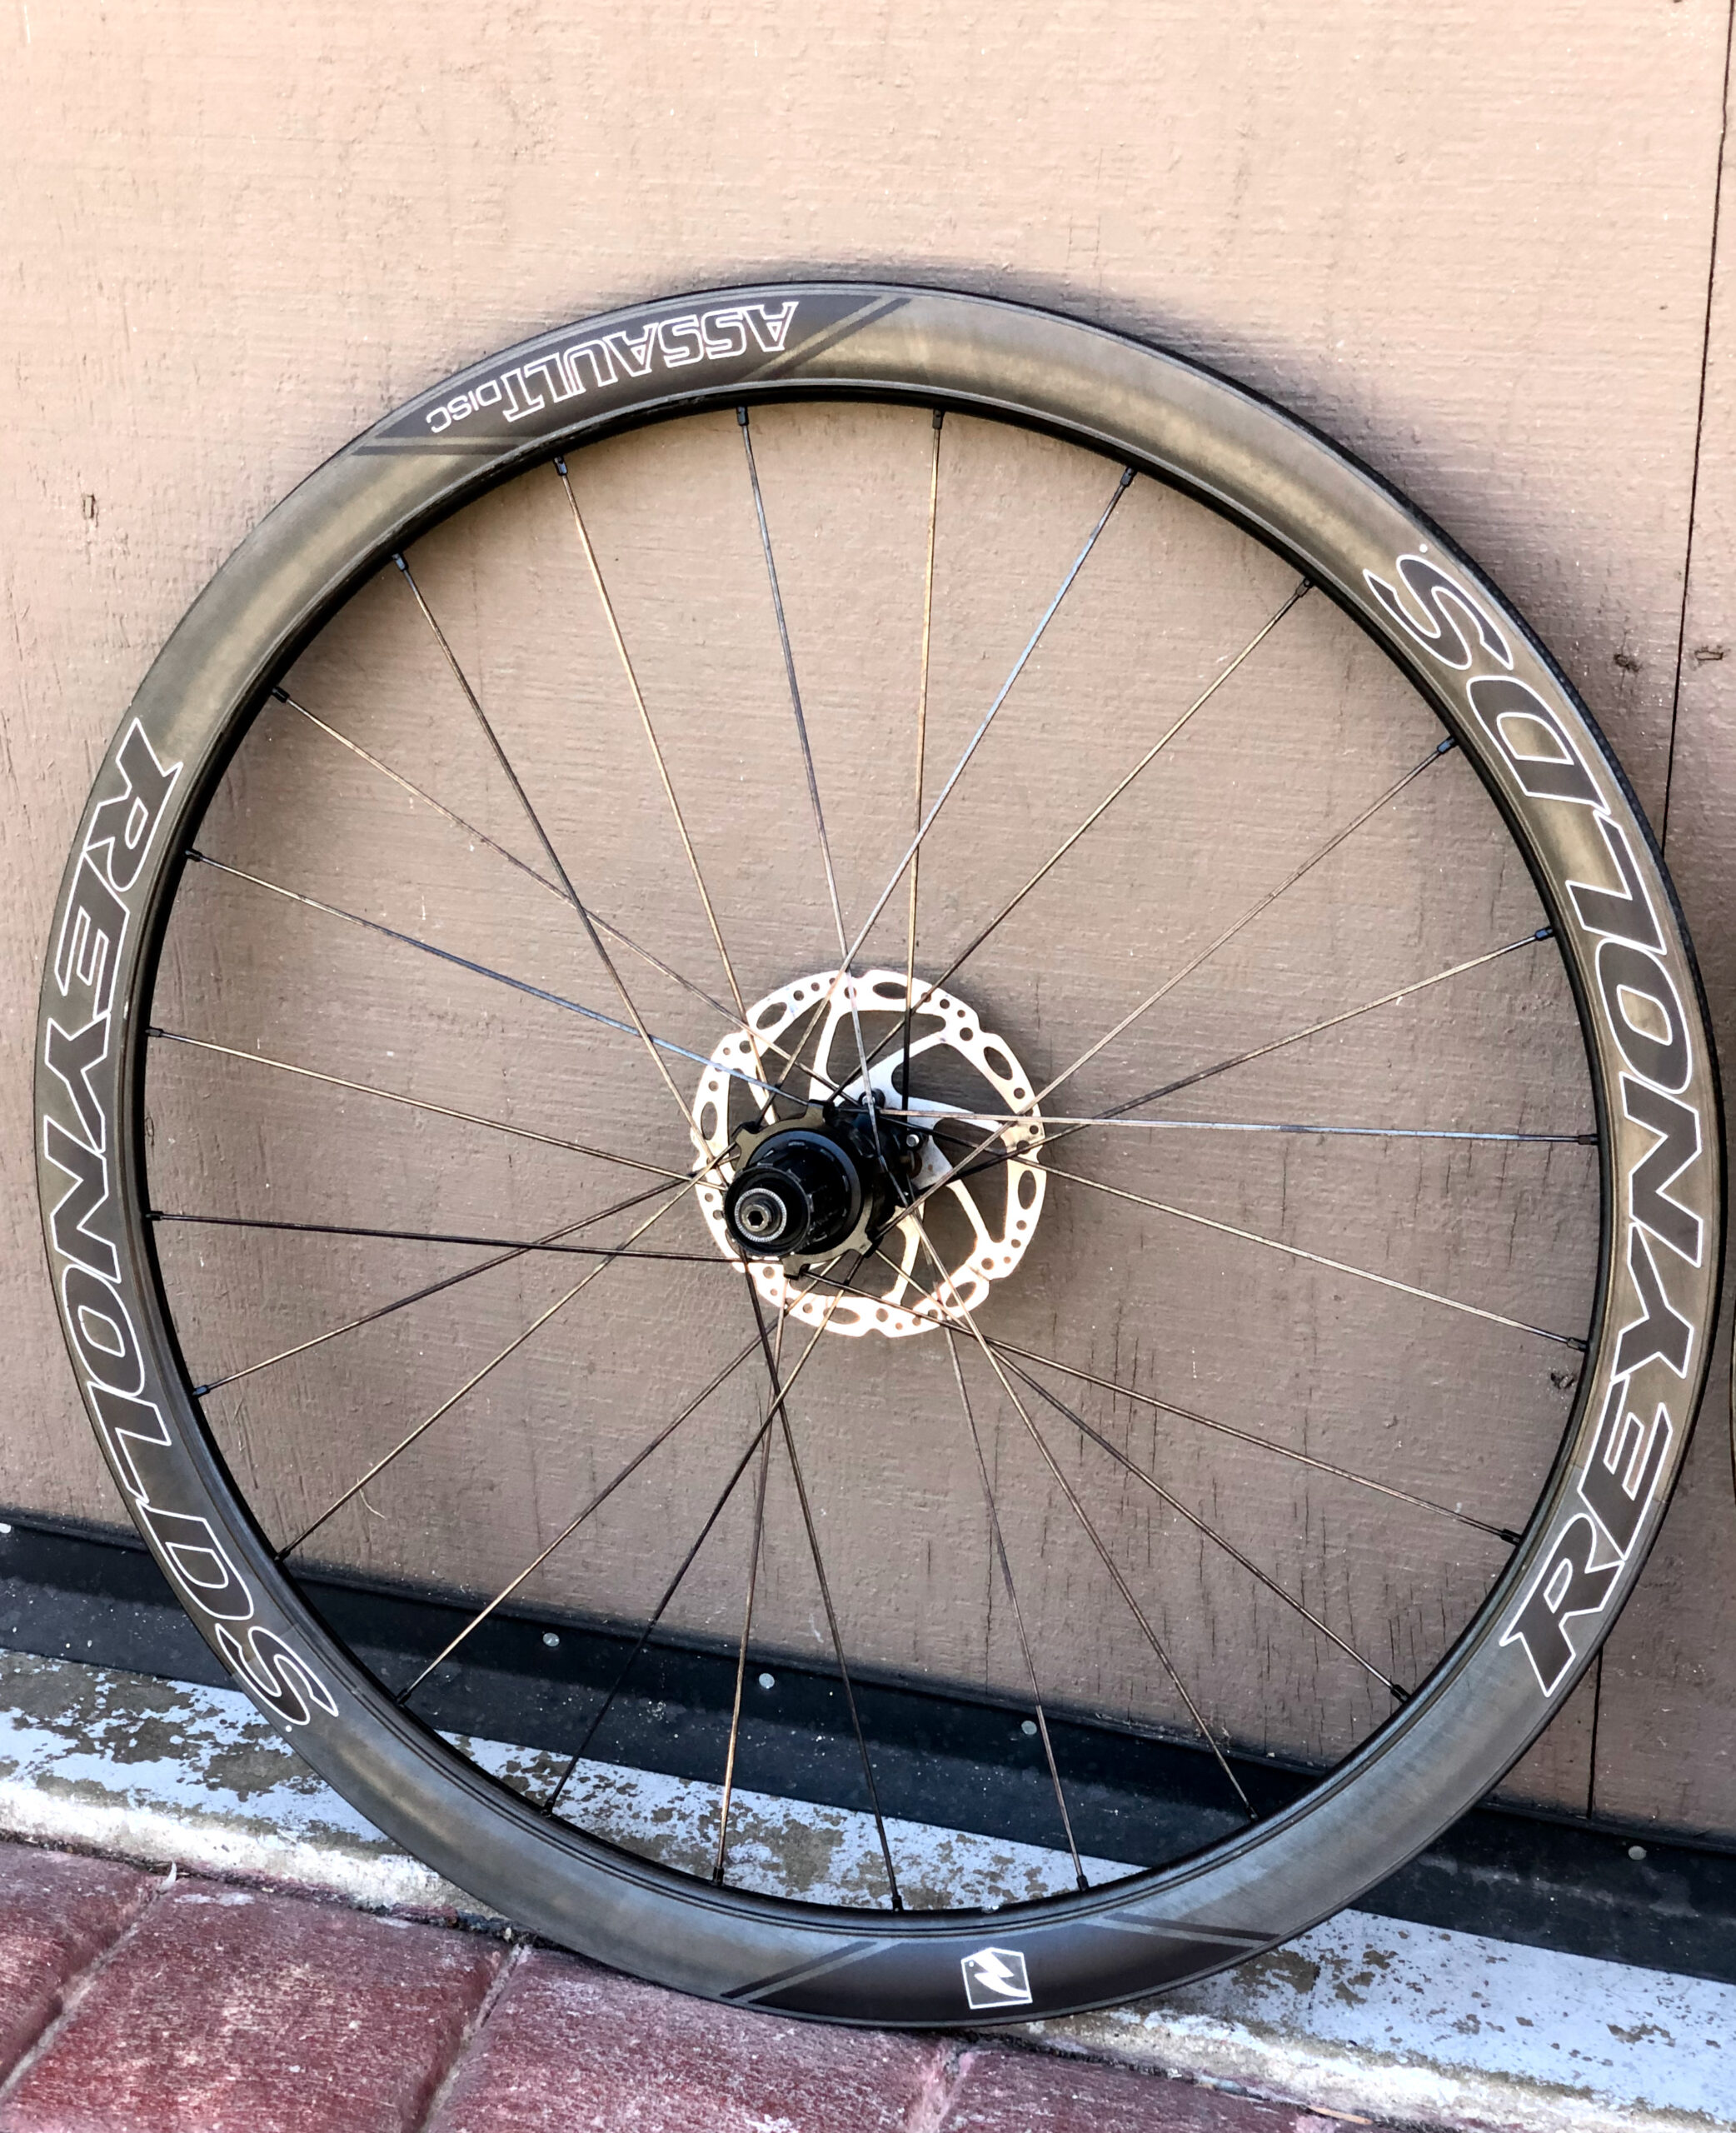 Reynolds Assault SLG Carbon Disc Tubular Aero Road Bike Wheelset 11 sp w/ Rotors